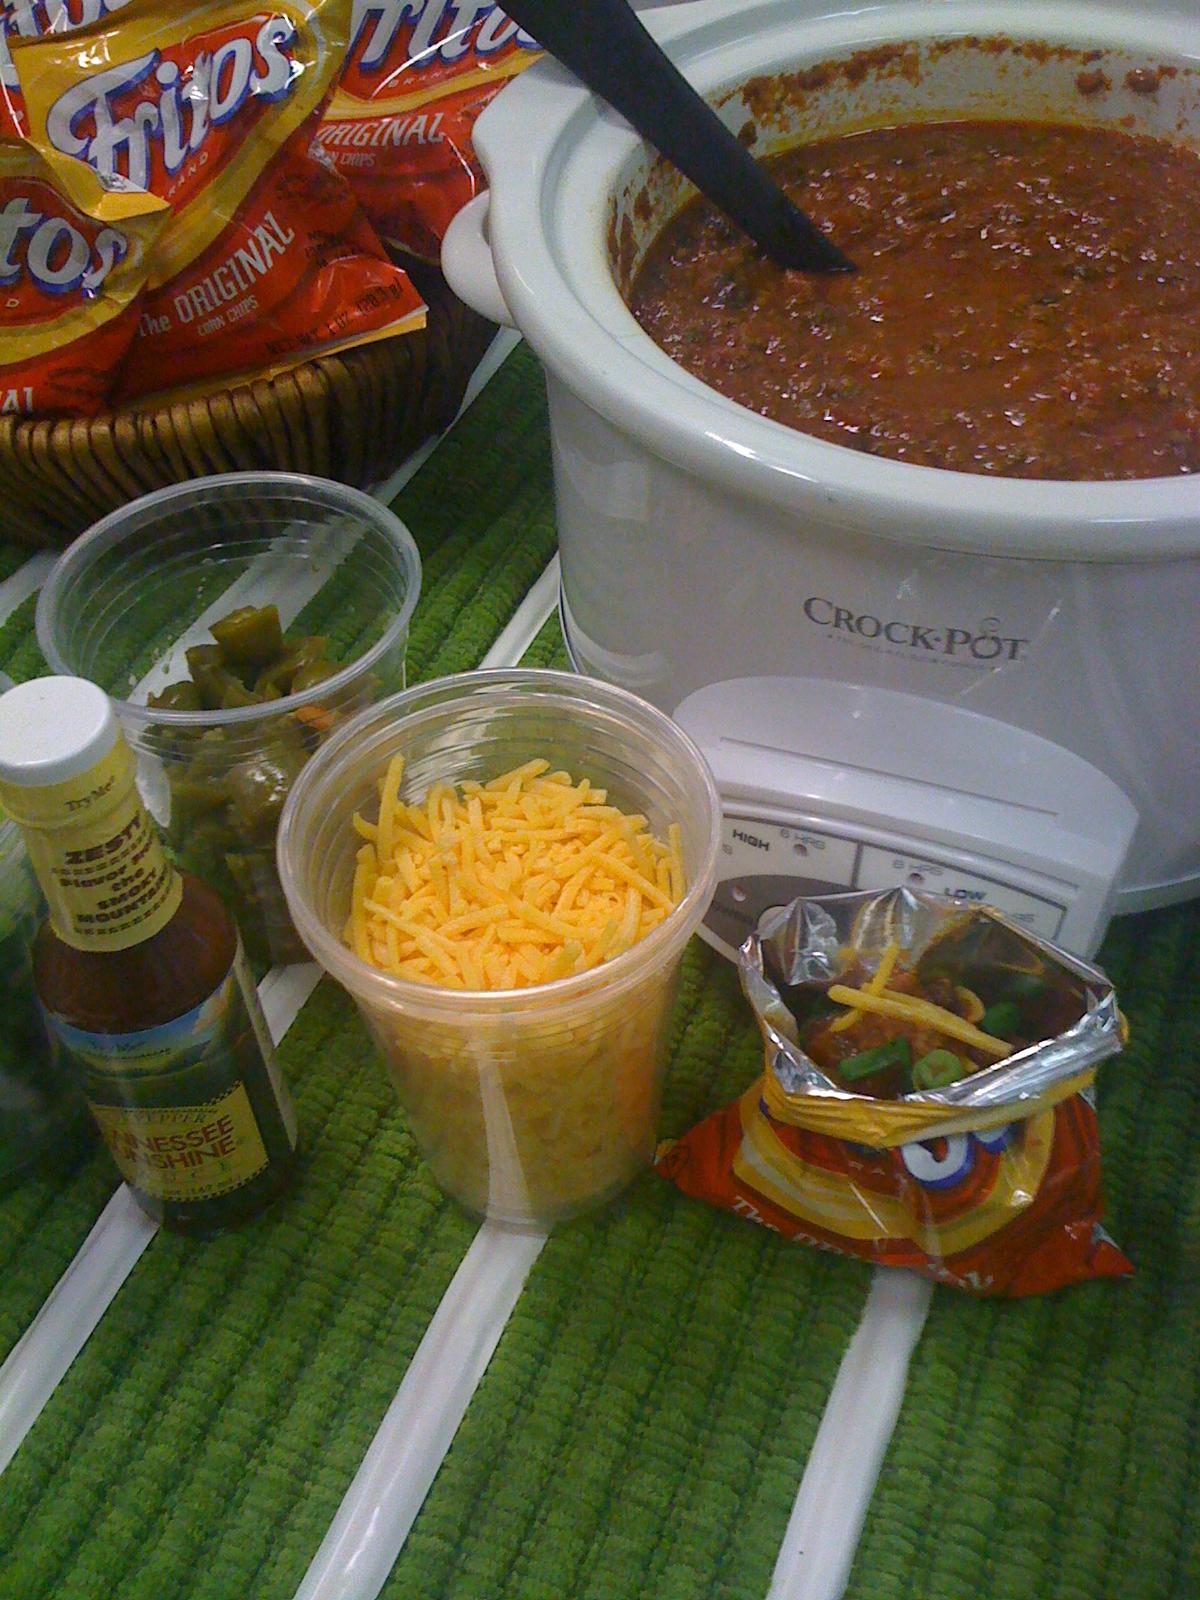 Serve your chili in individual Frito or Dorito bags... delish and no dishes!